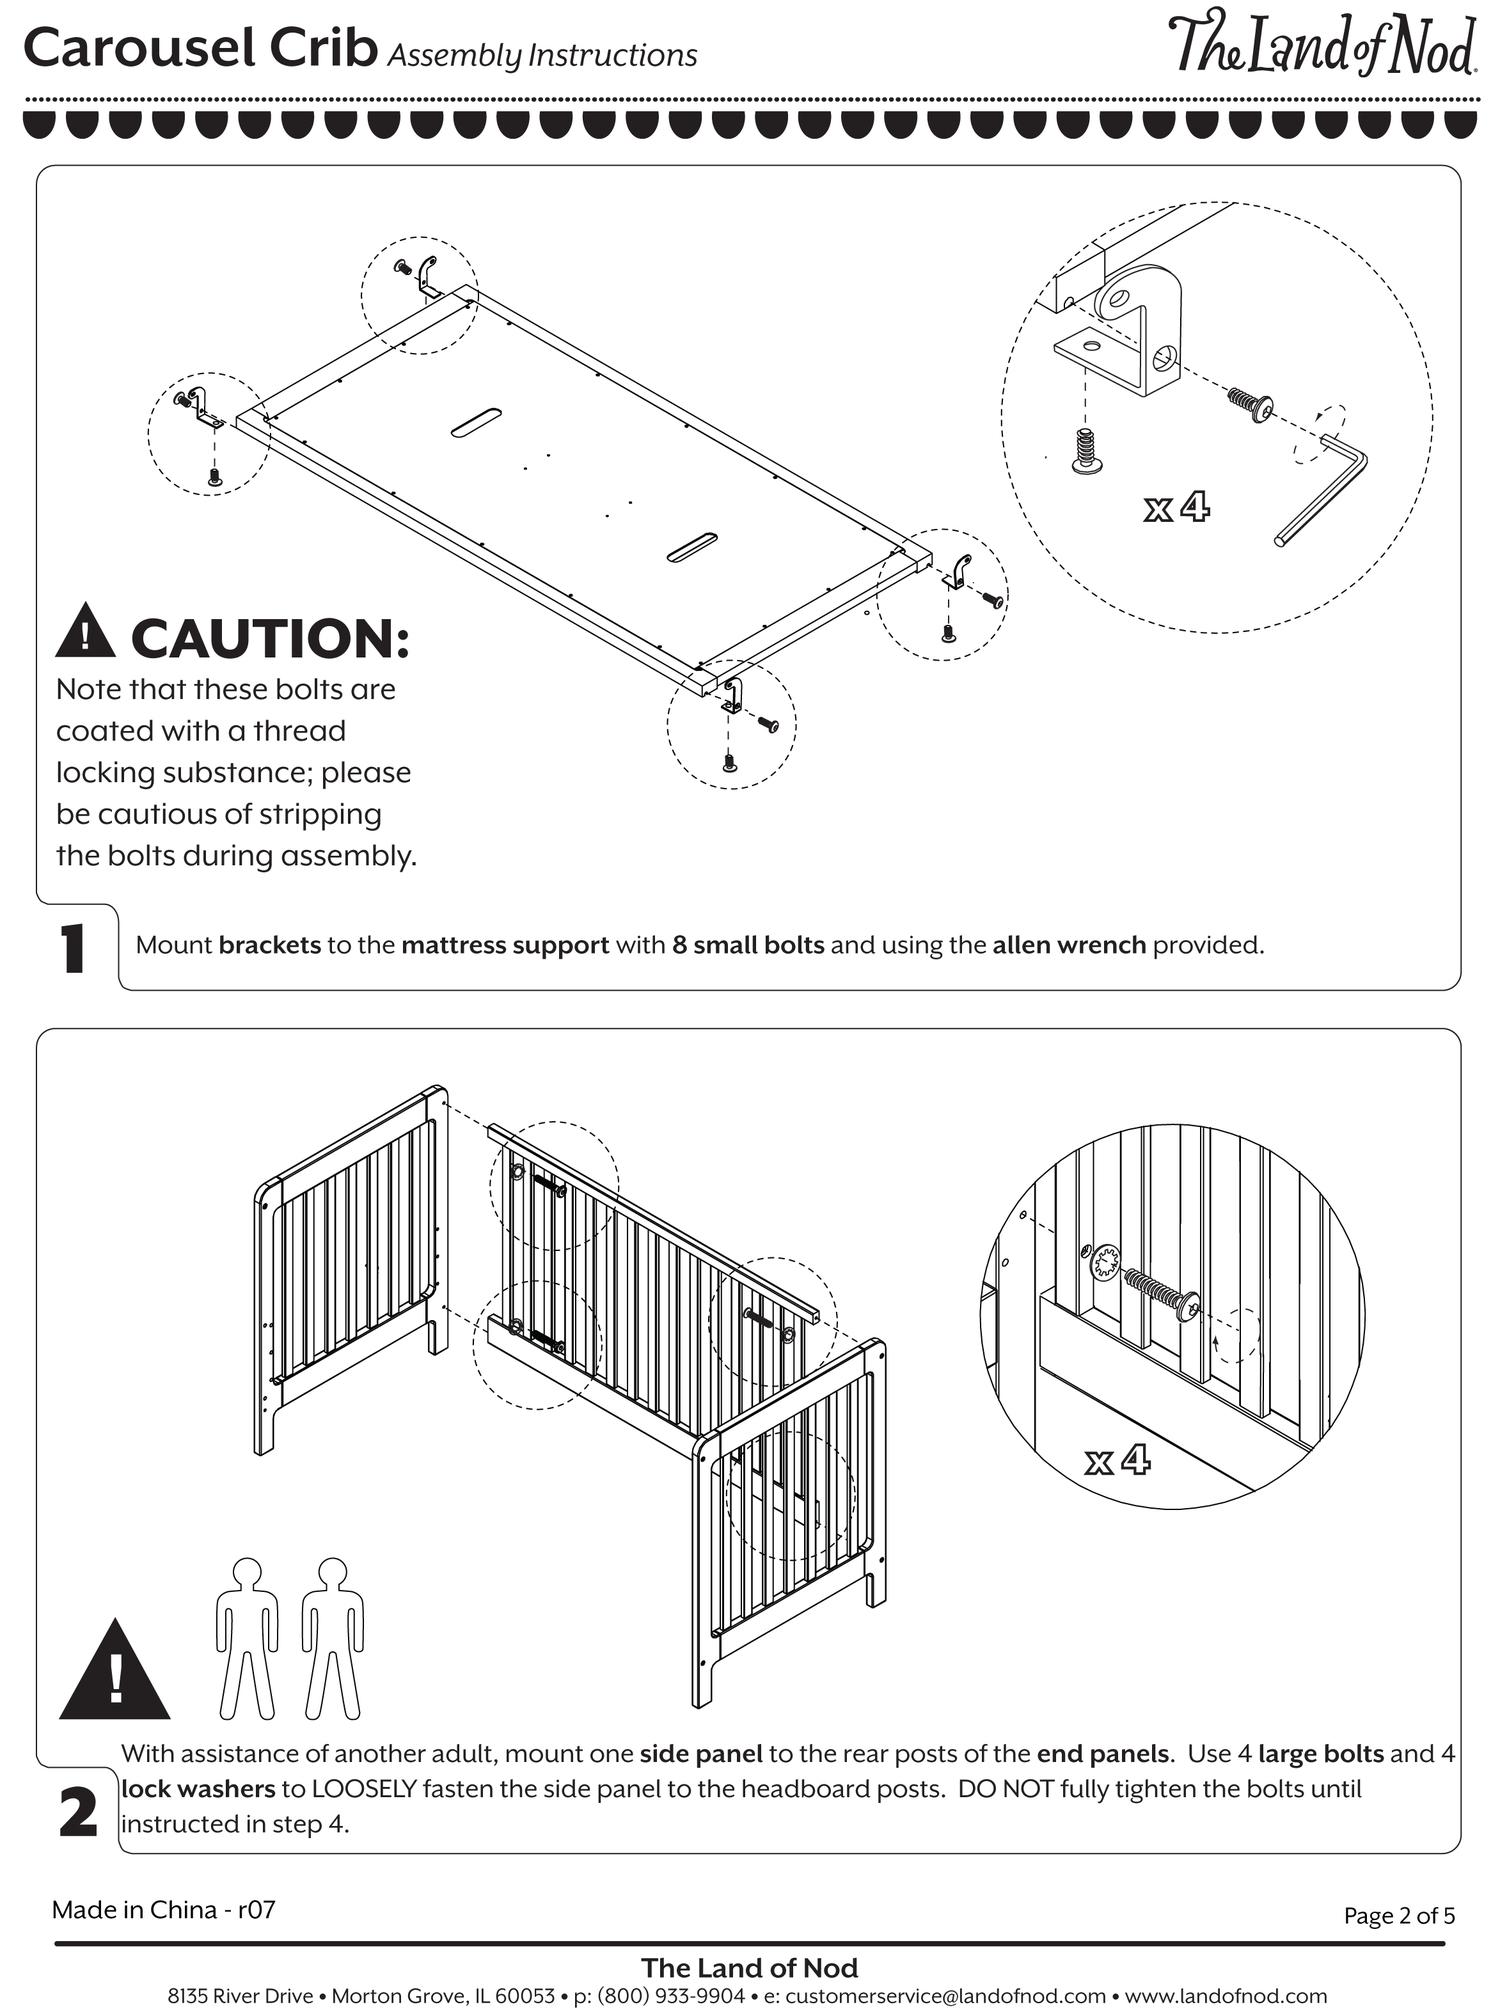 Assembly Instructions Christina Fehan